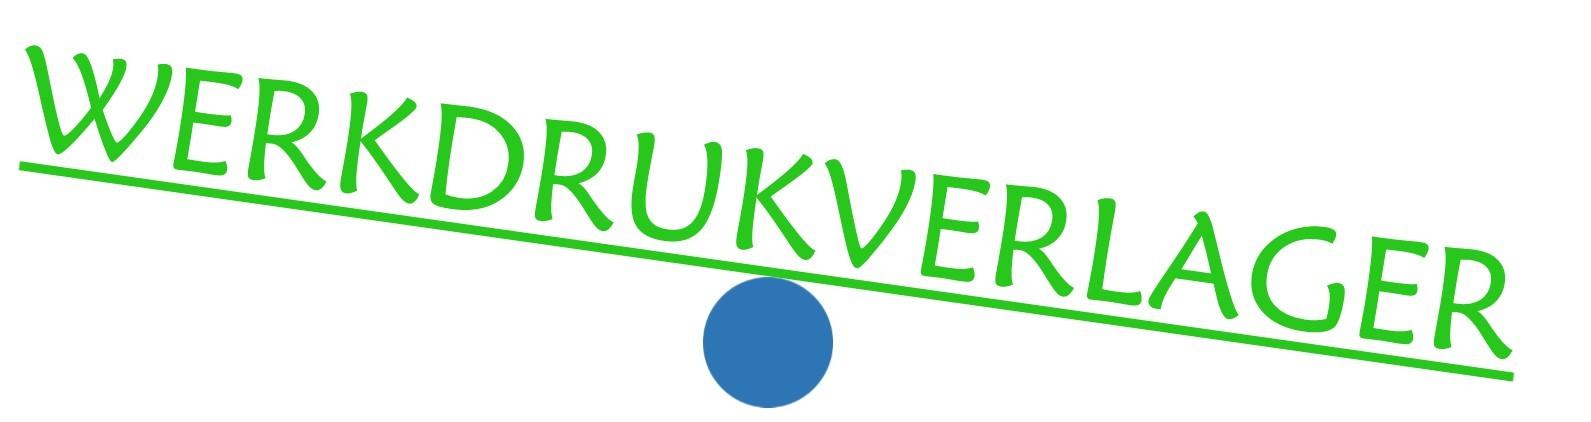 logo Werkdrukverlager